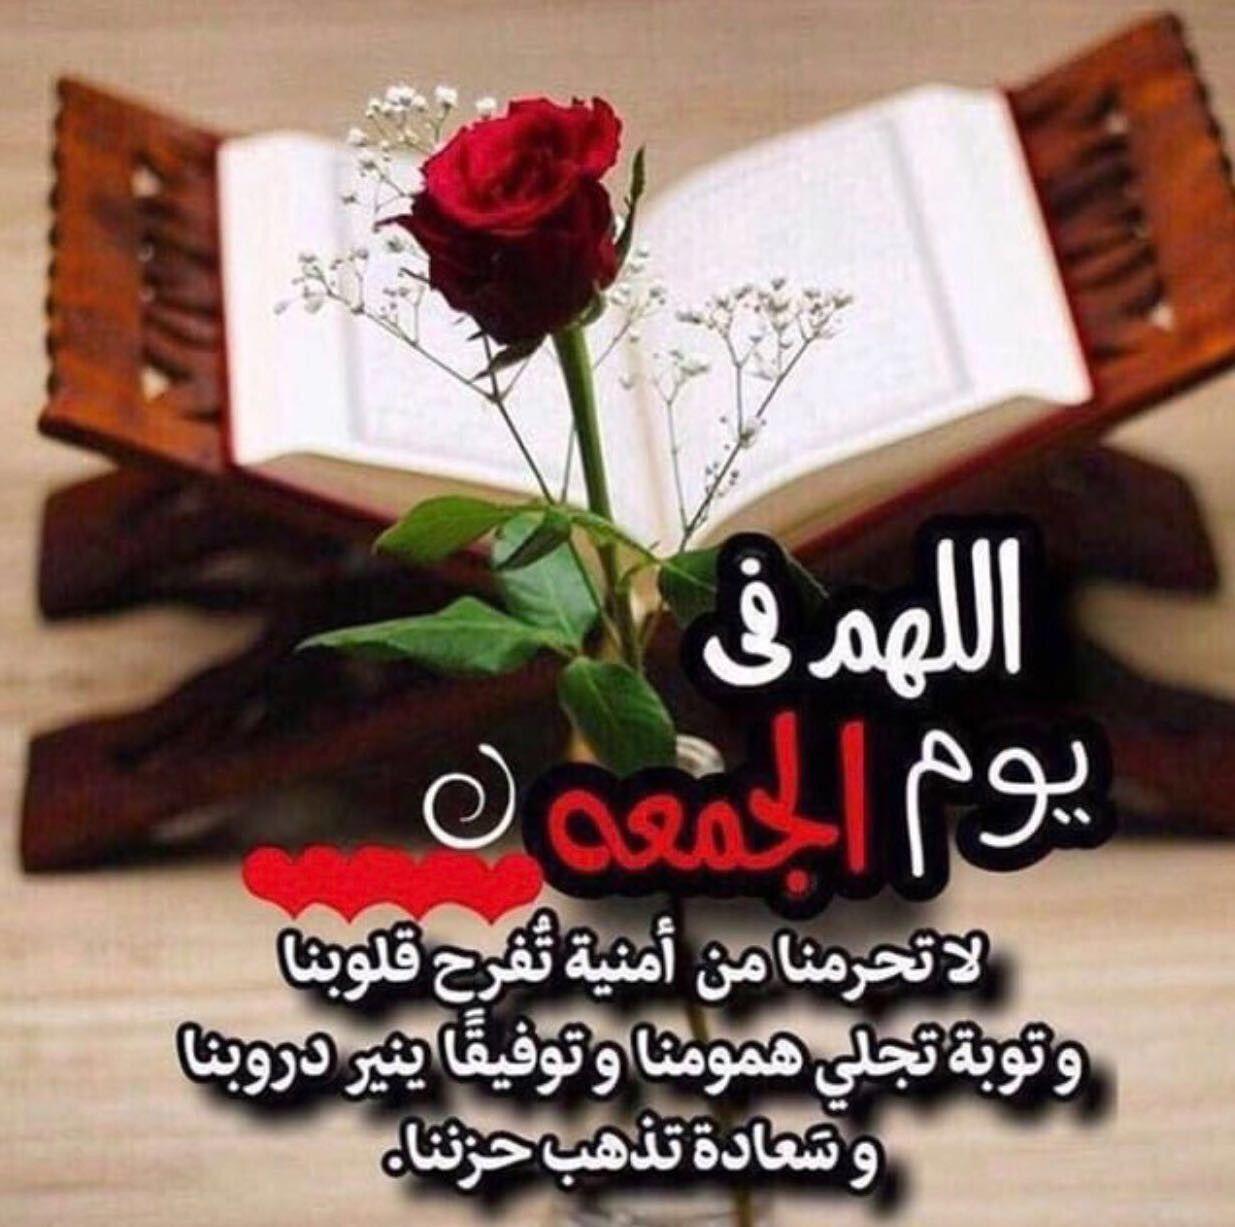 Pin By Mr E Ali On جميل الكلم Its Friday Quotes Jumah Mubarak Blessed Friday